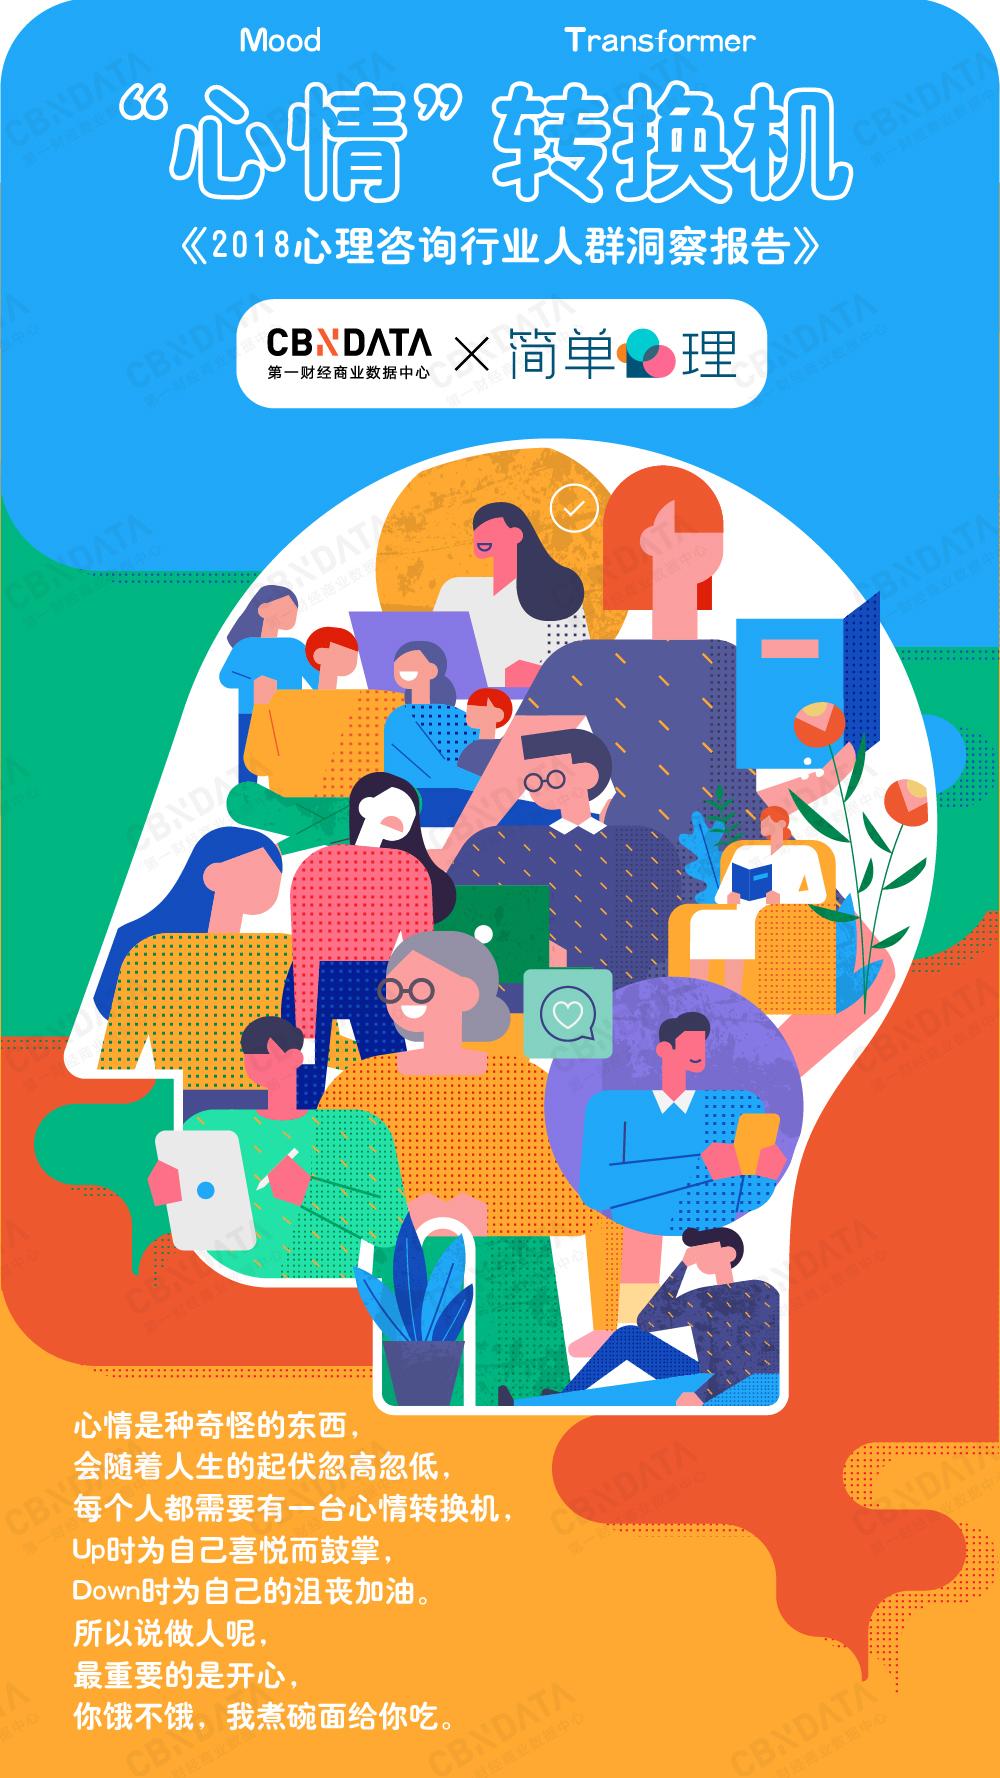 CBNData发布《2018心理咨询行业人群洞察报告》